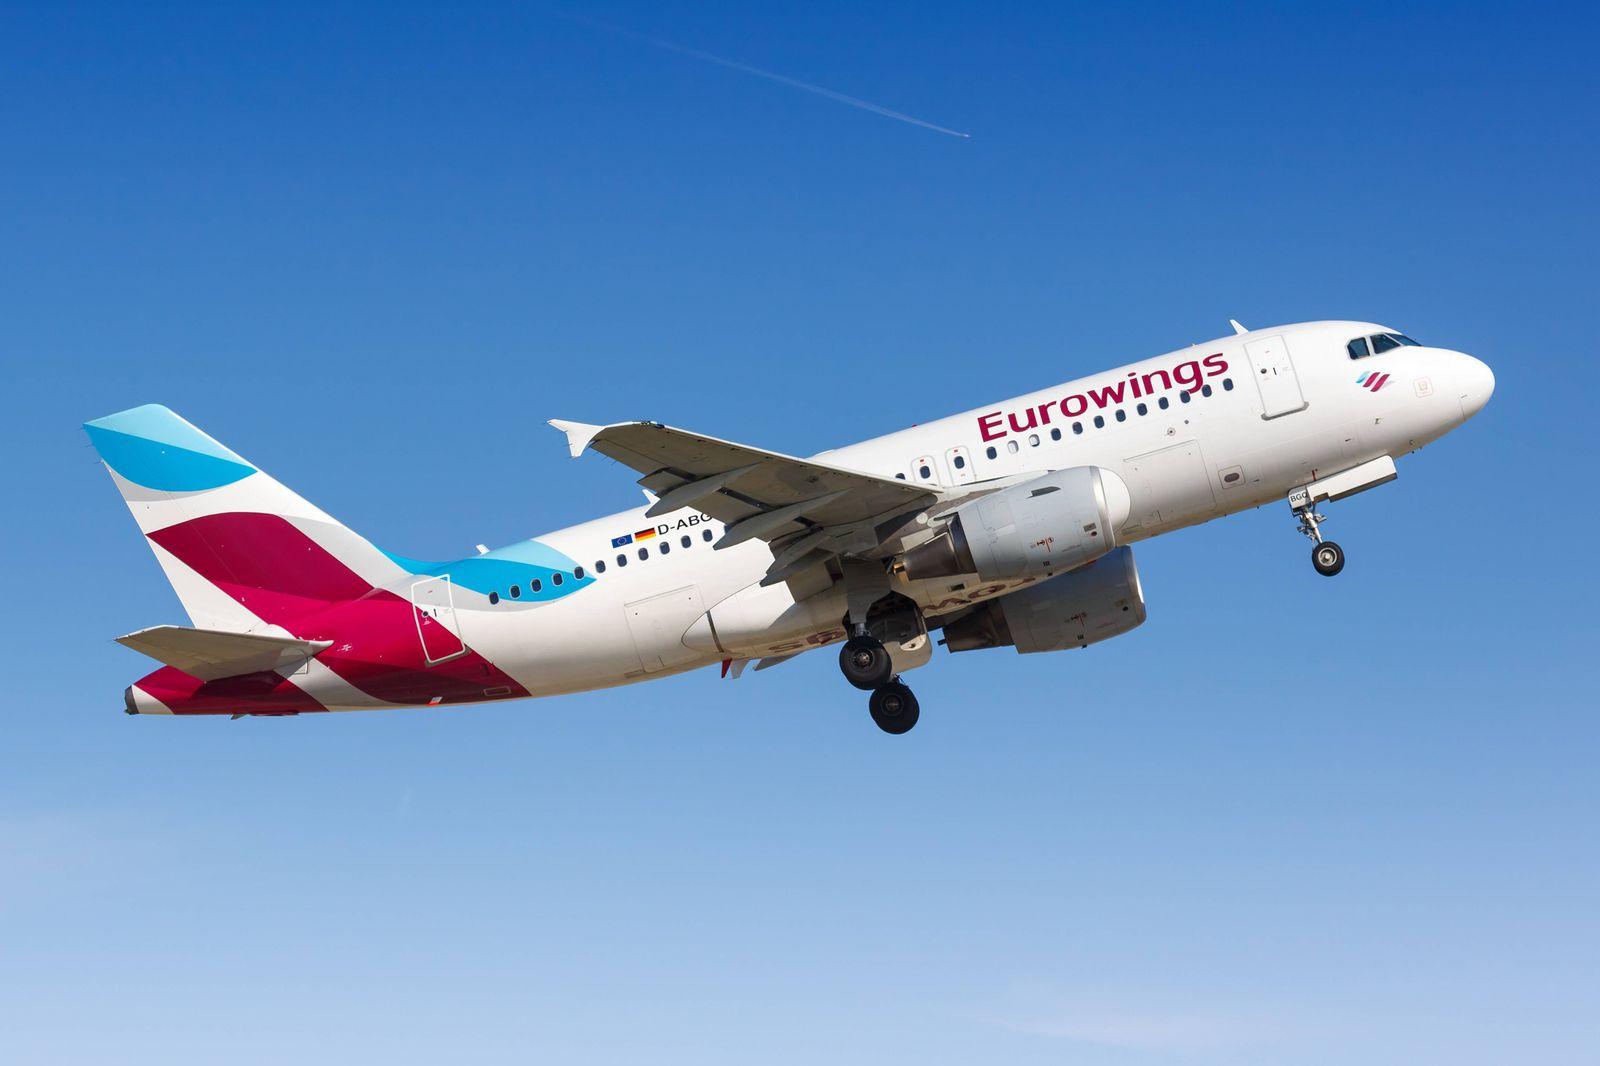 Eurowings Airbus A319 Flugzeug Stuttgart Deutschland 6 April 2018 Ein Airbus A319 der Eurowings